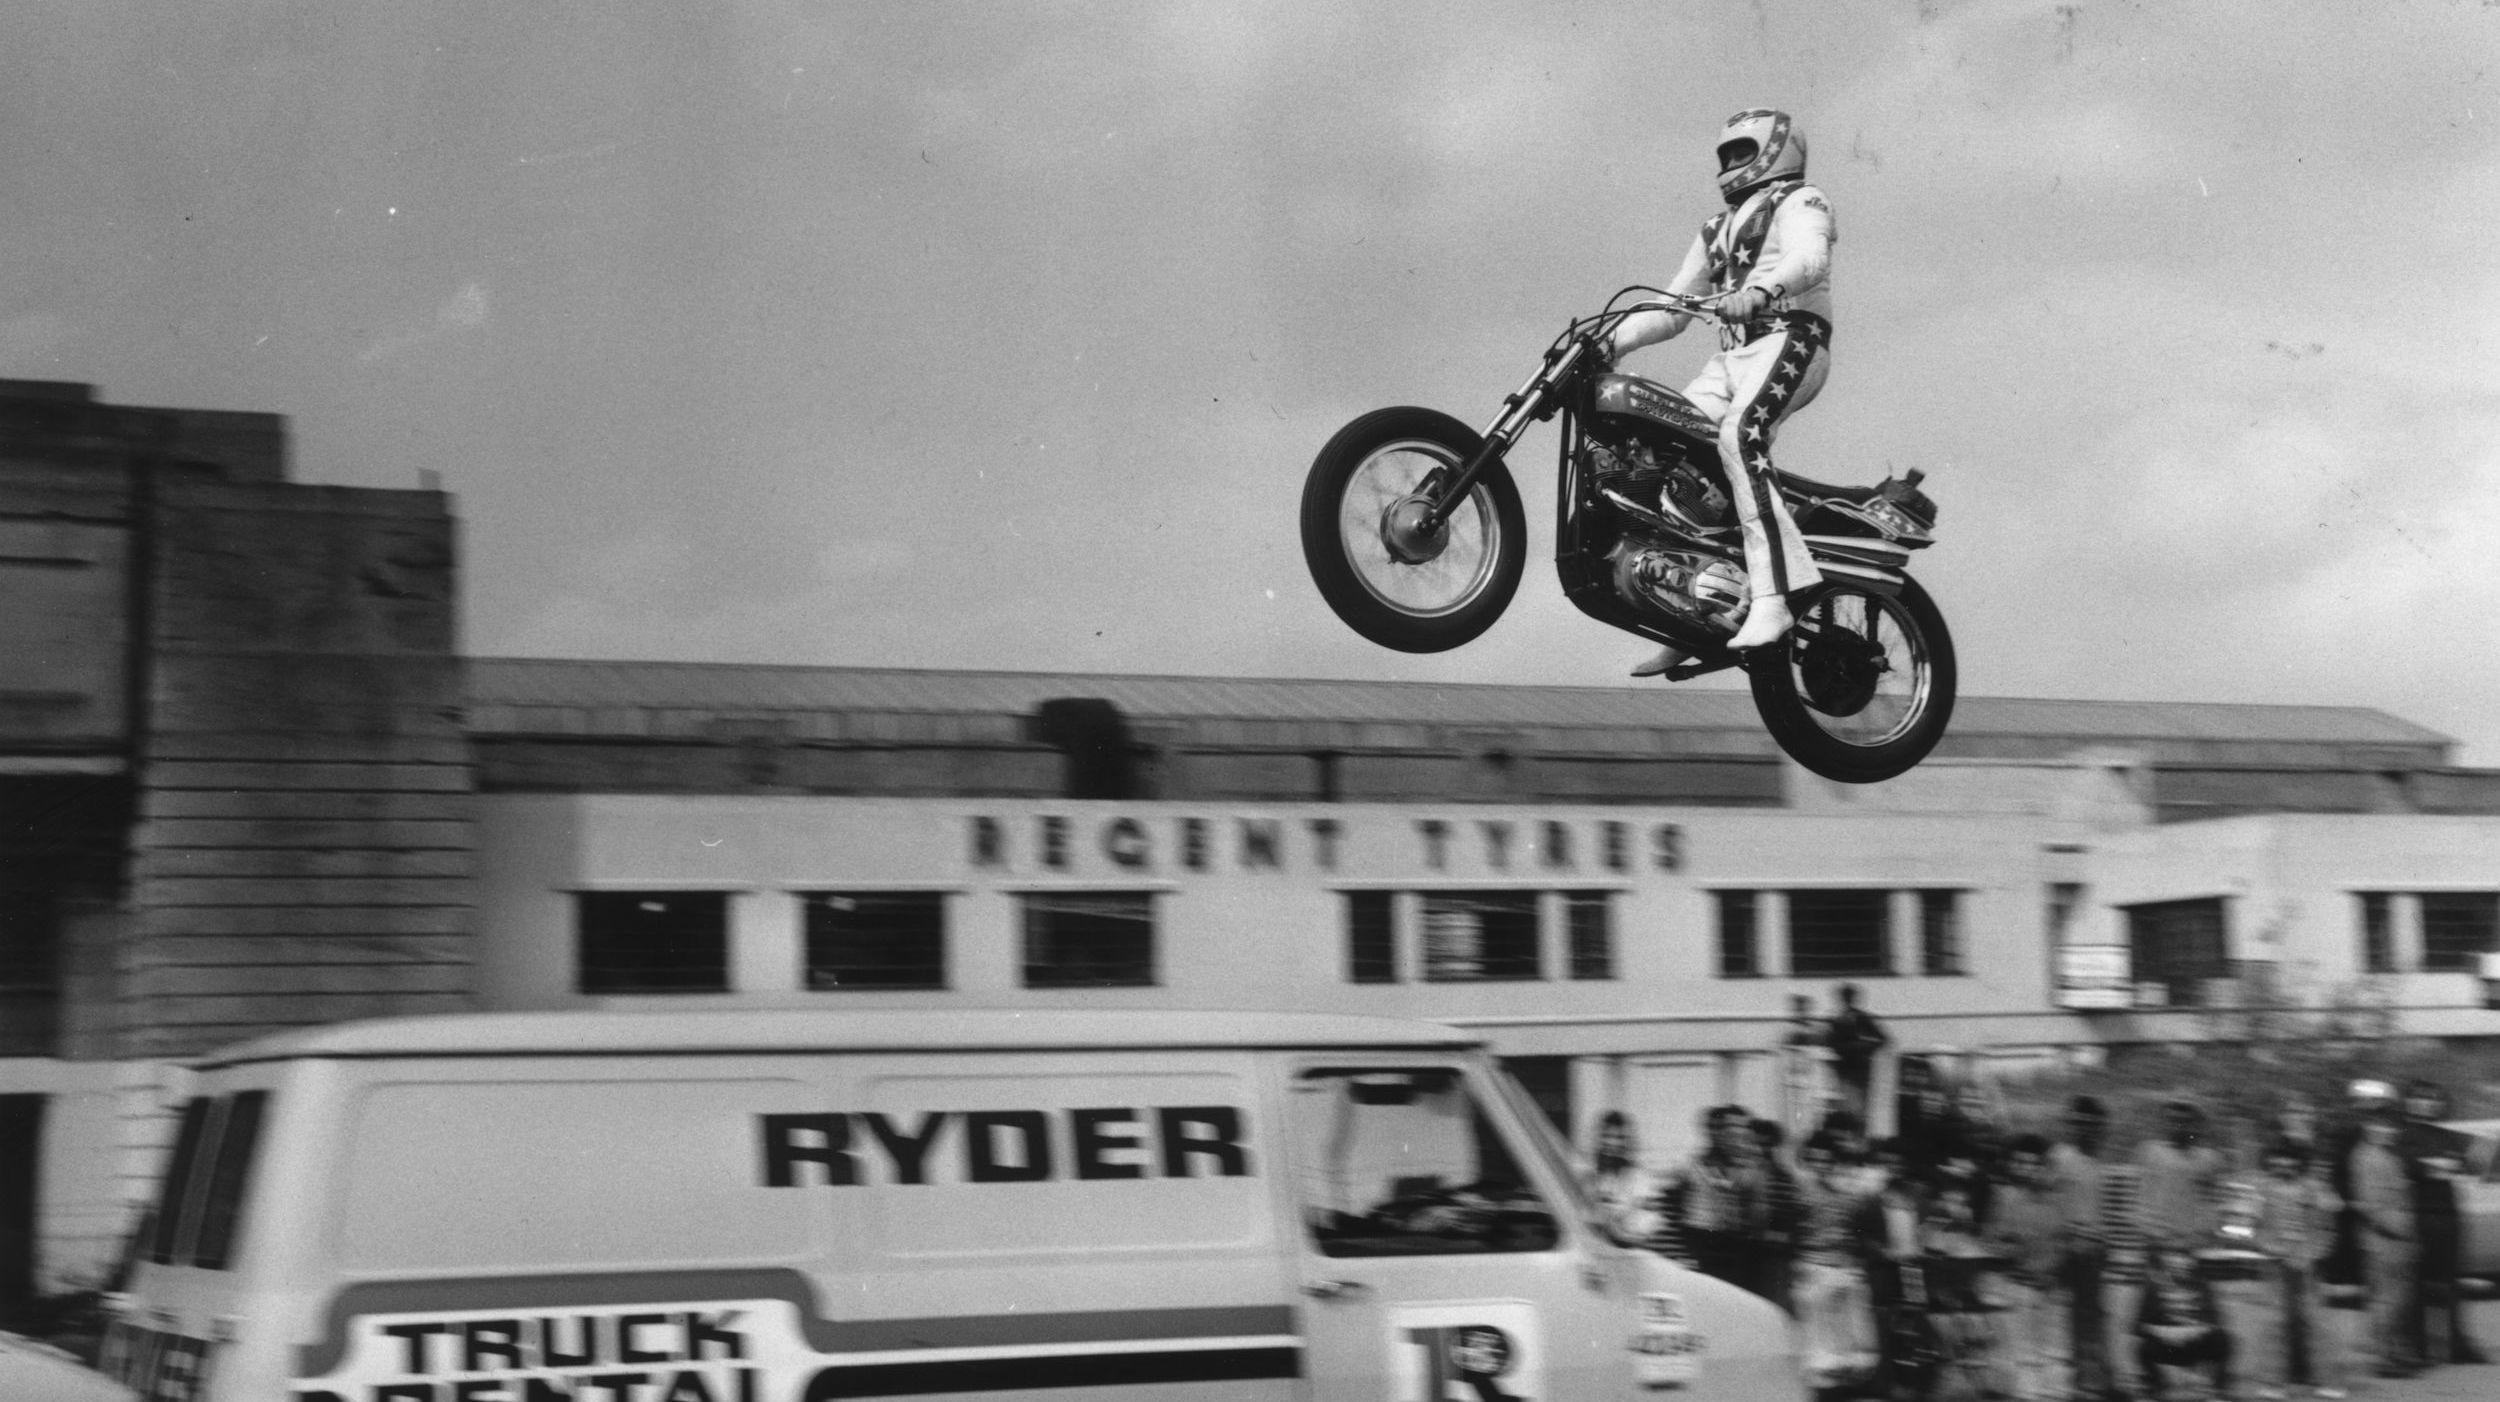 EVEL KNIEVEL TRACKER BENZIN MOTORCYCLES